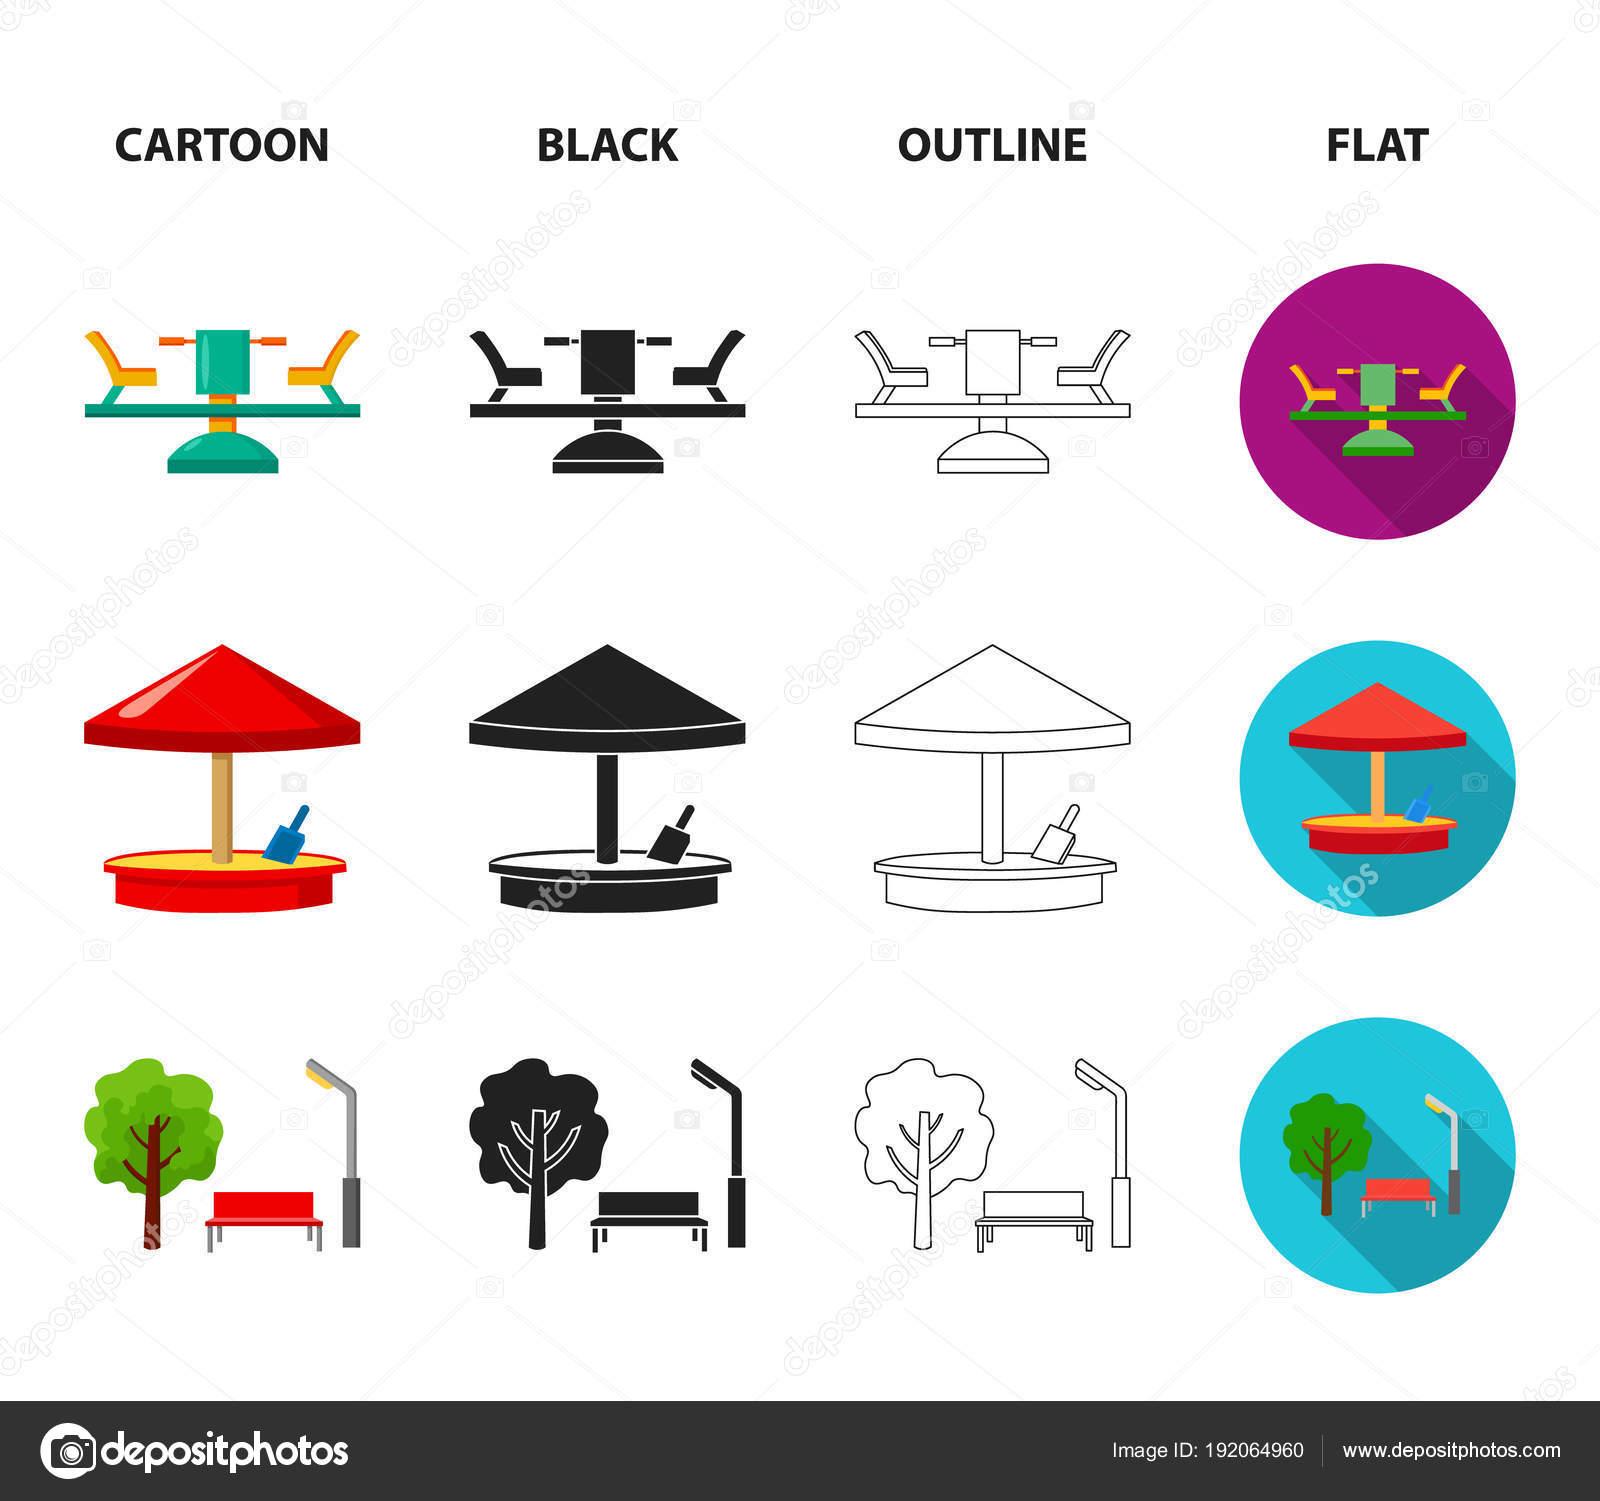 Carrossel caixa de areia parque triciclo parque infantil set parque infantil set coleo cones em desenhos animados preto contorno estilo plano vector smbolo conservado em estoque ilustrao vetor de ccuart Gallery